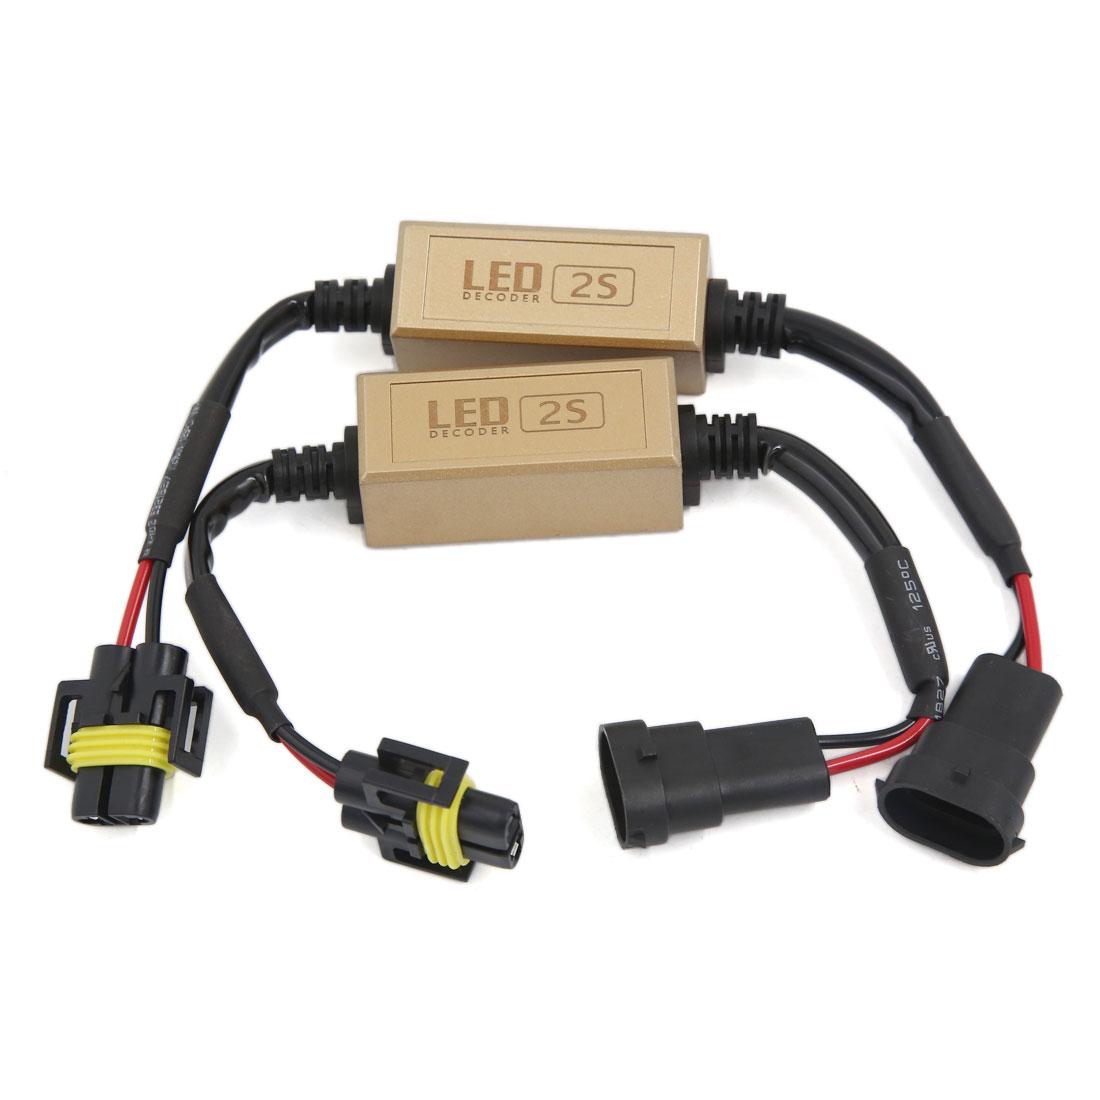 2 Pcs H11 LED Decoder Error Anti-Flicker Free Load Resistor Canceller for Cars